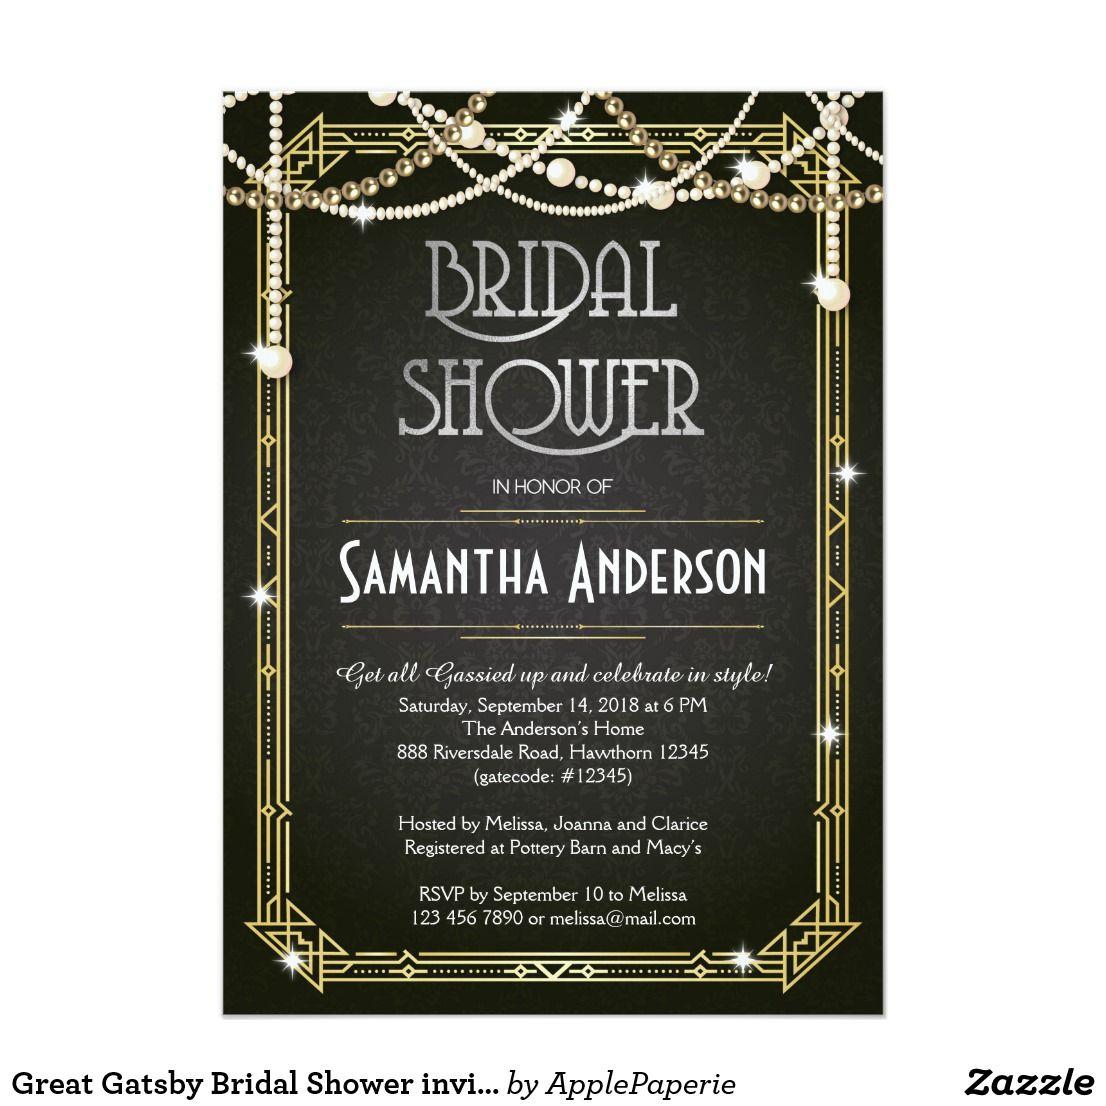 Great gatsby bridal shower invitation art deco bridal shower great gatsby bridal shower invitation art deco filmwisefo